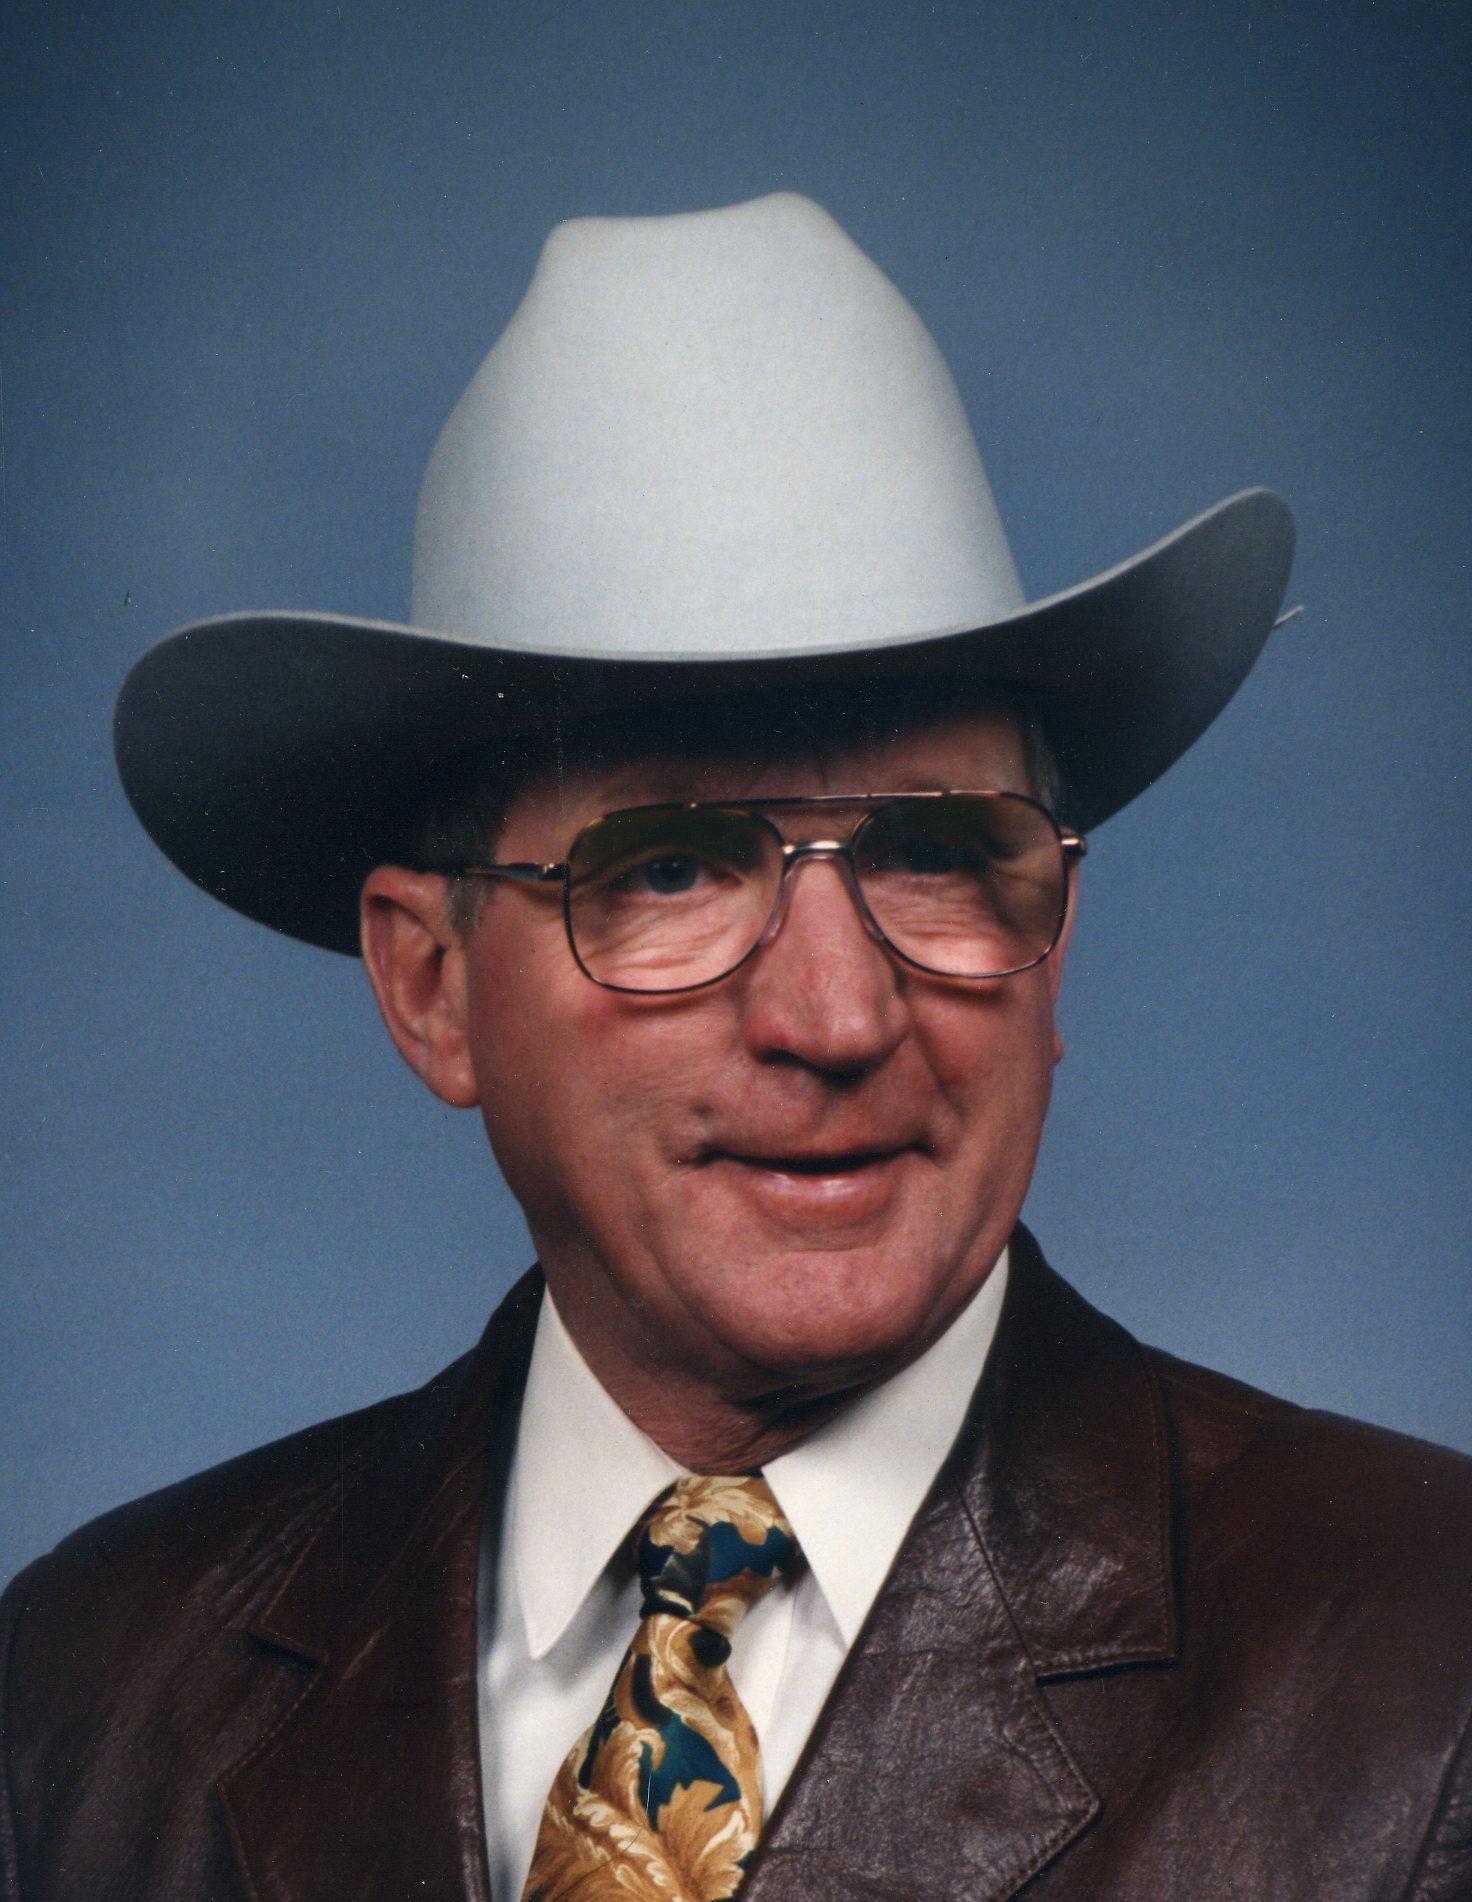 Dean C. Martin, 81 of Lexington, NE and Apache Junction, AZ